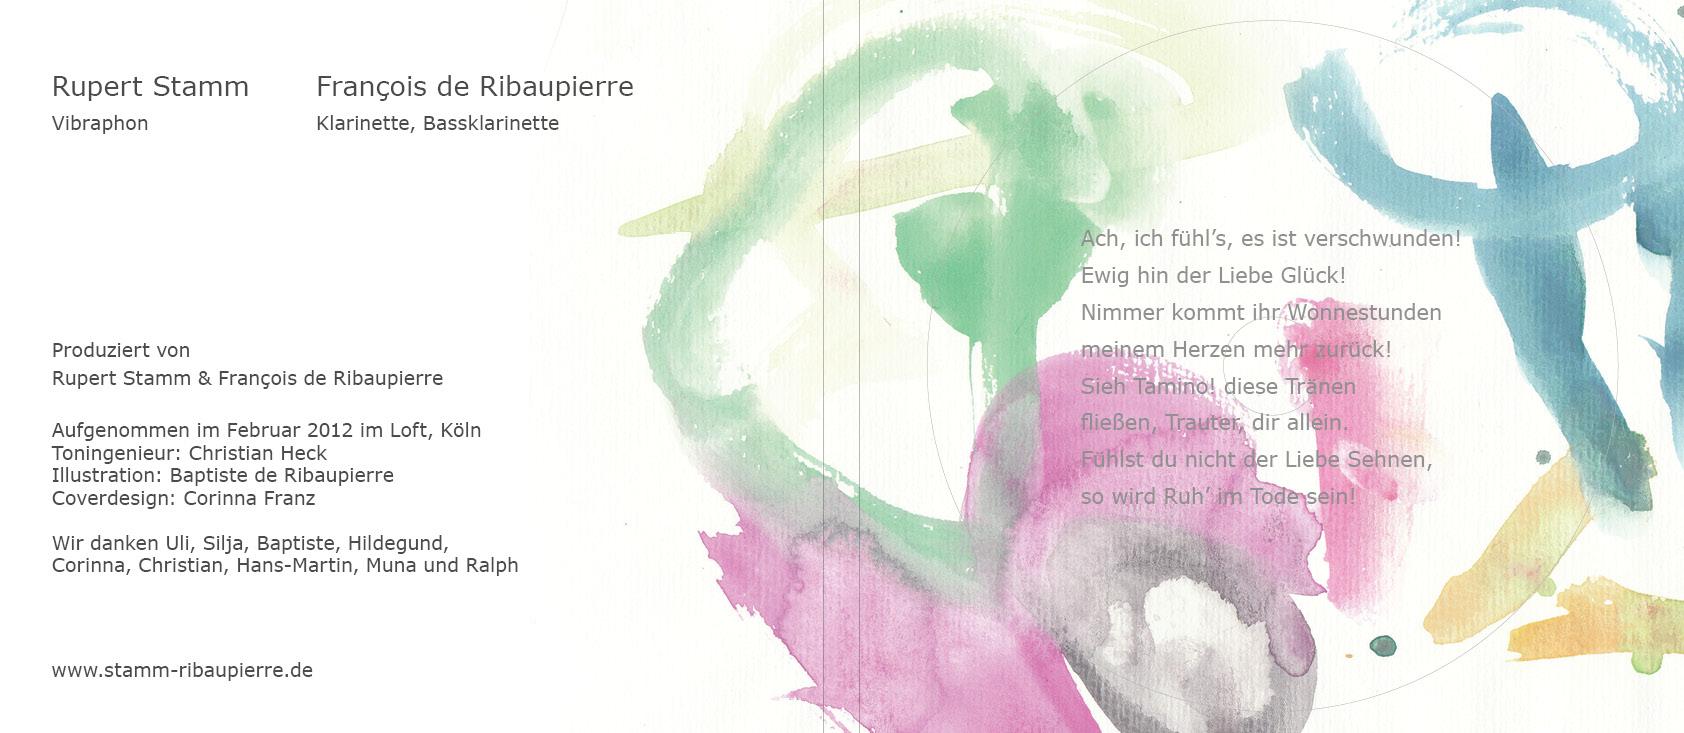 CD Cover, Ruper Stamm und François de Ribaupierre